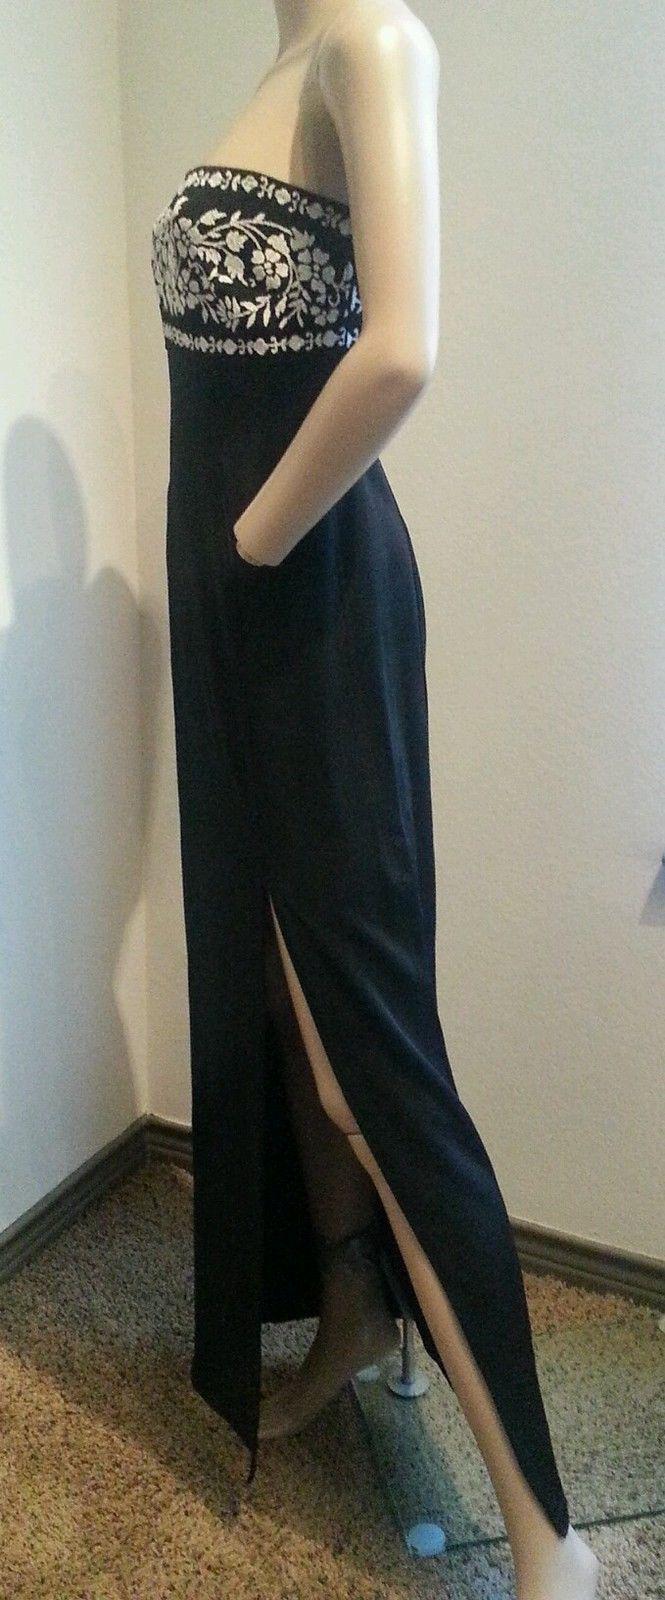 Vtg 90's Tadashi Black White Floral Beaded Cutout Bodycon Maxi Dress S